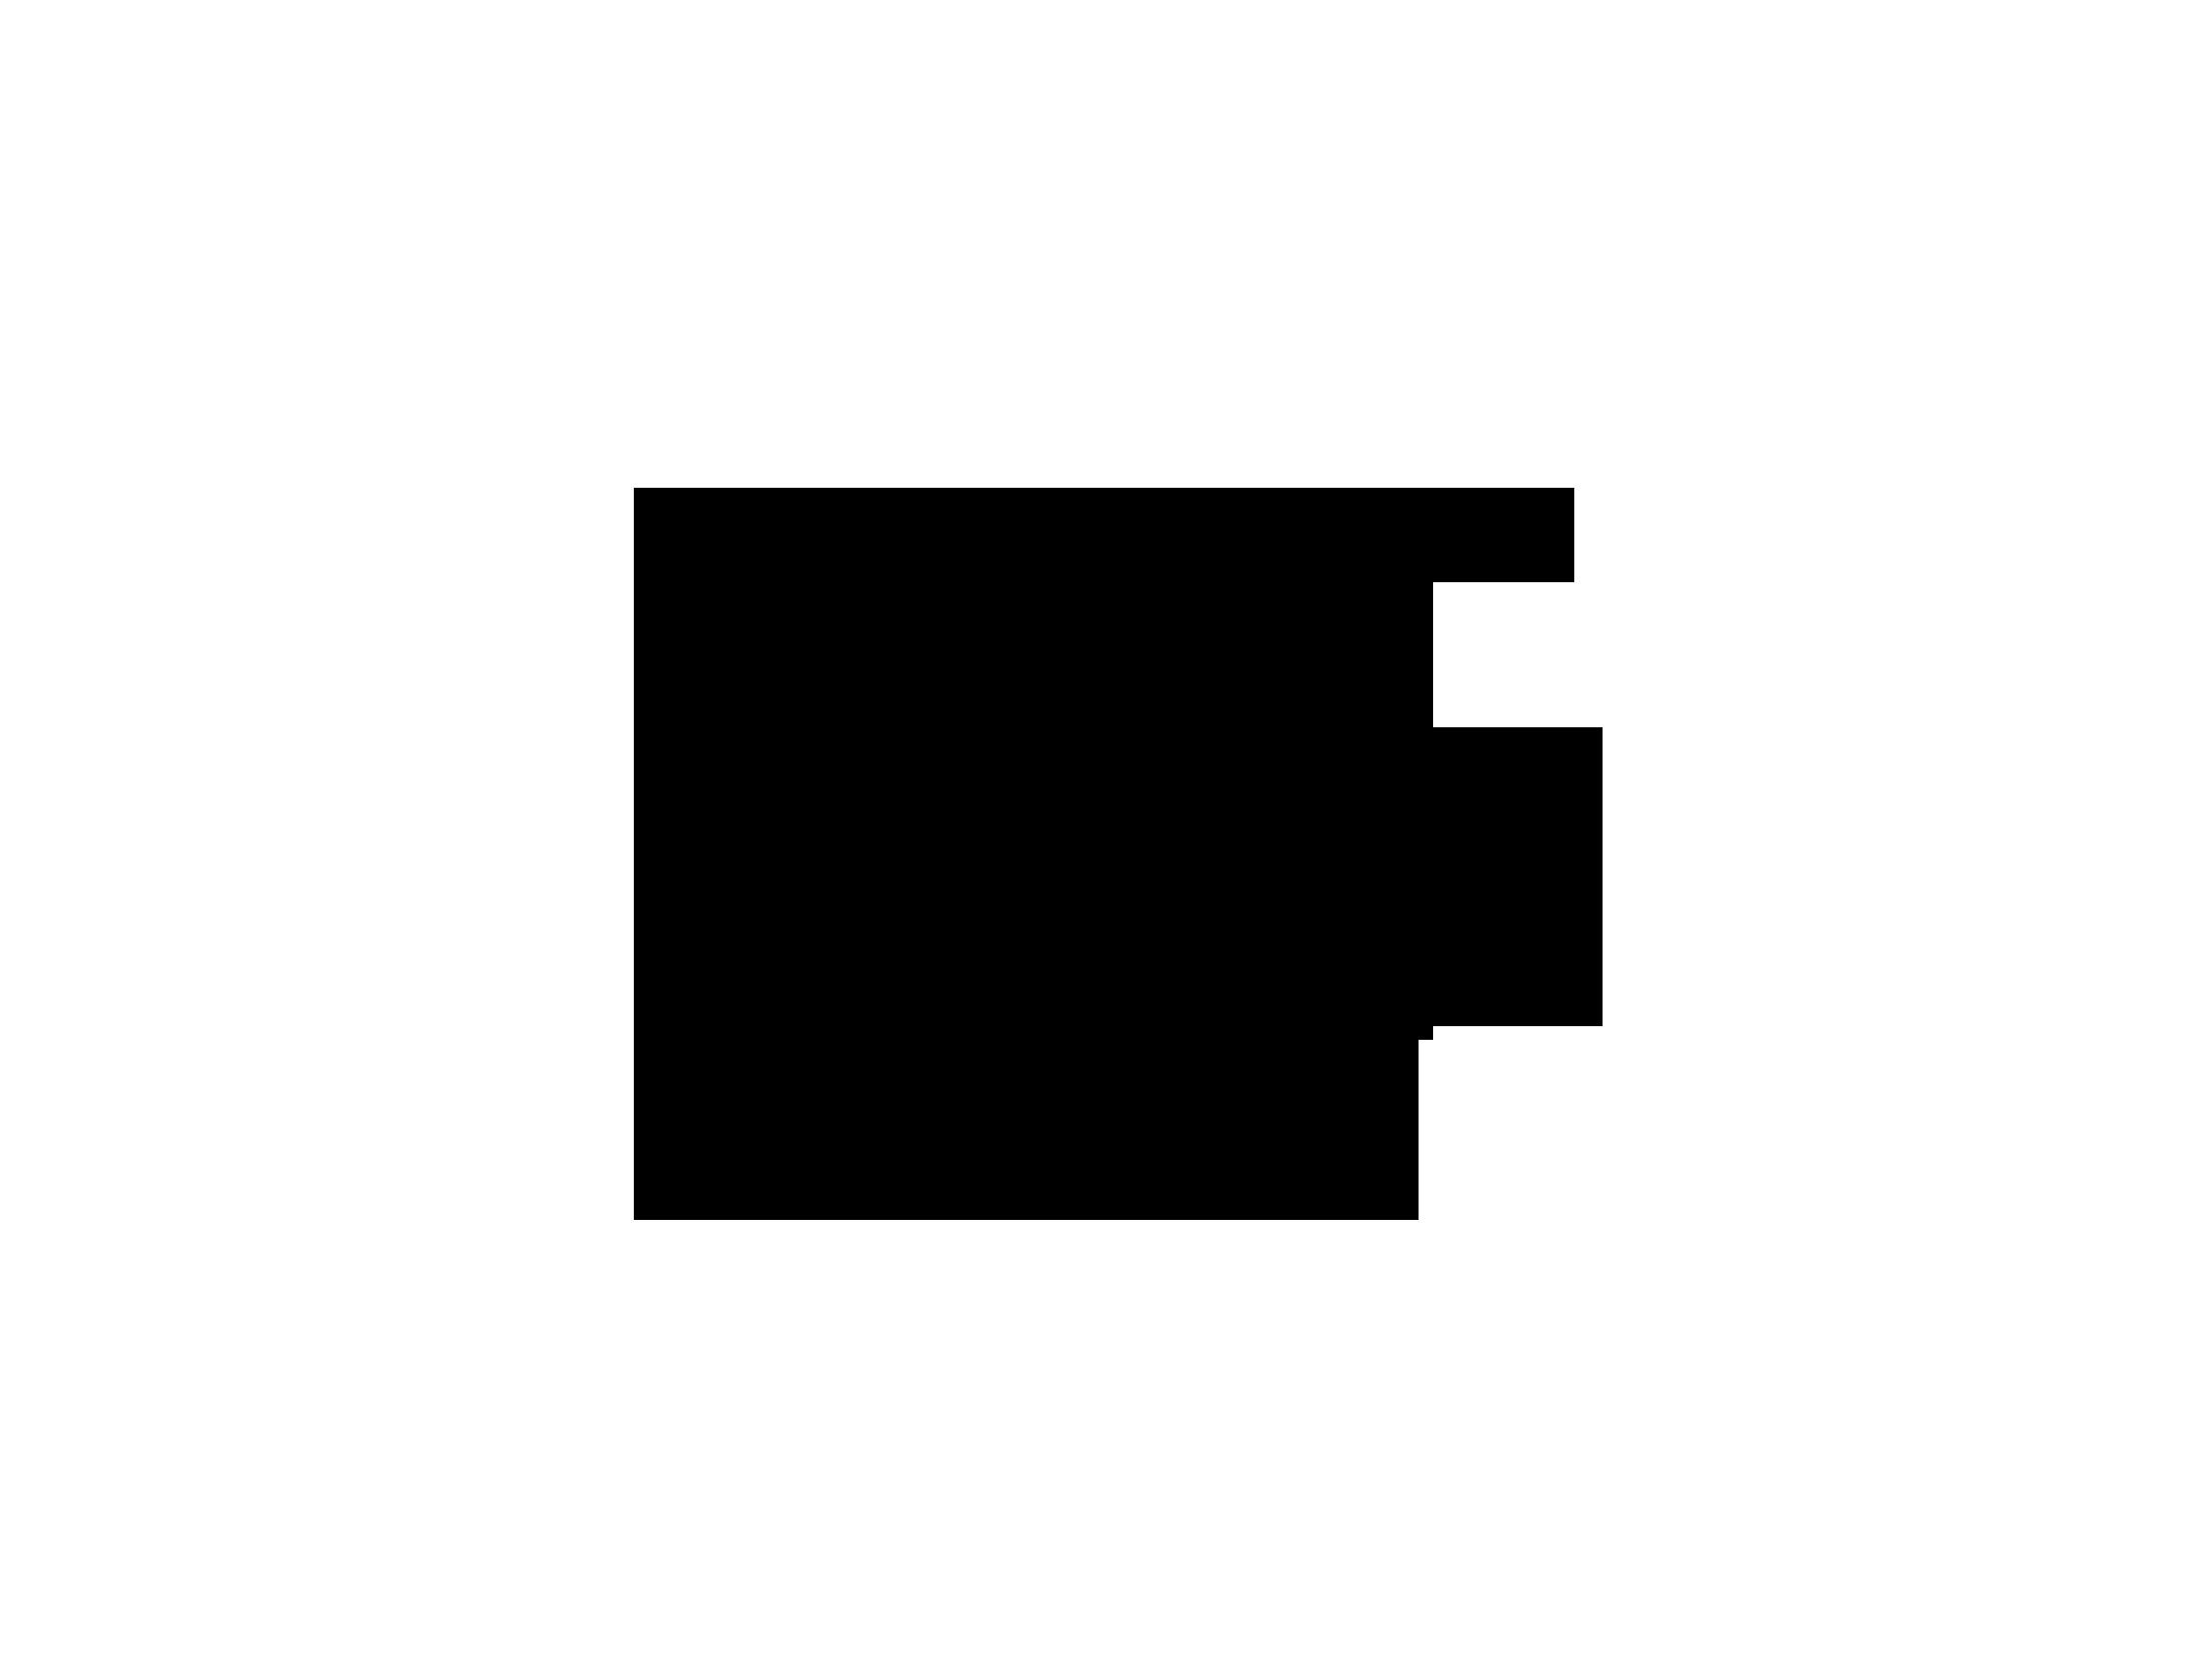 Versace logo logok brands pinterest versace and logos versace logo logok biocorpaavc Gallery